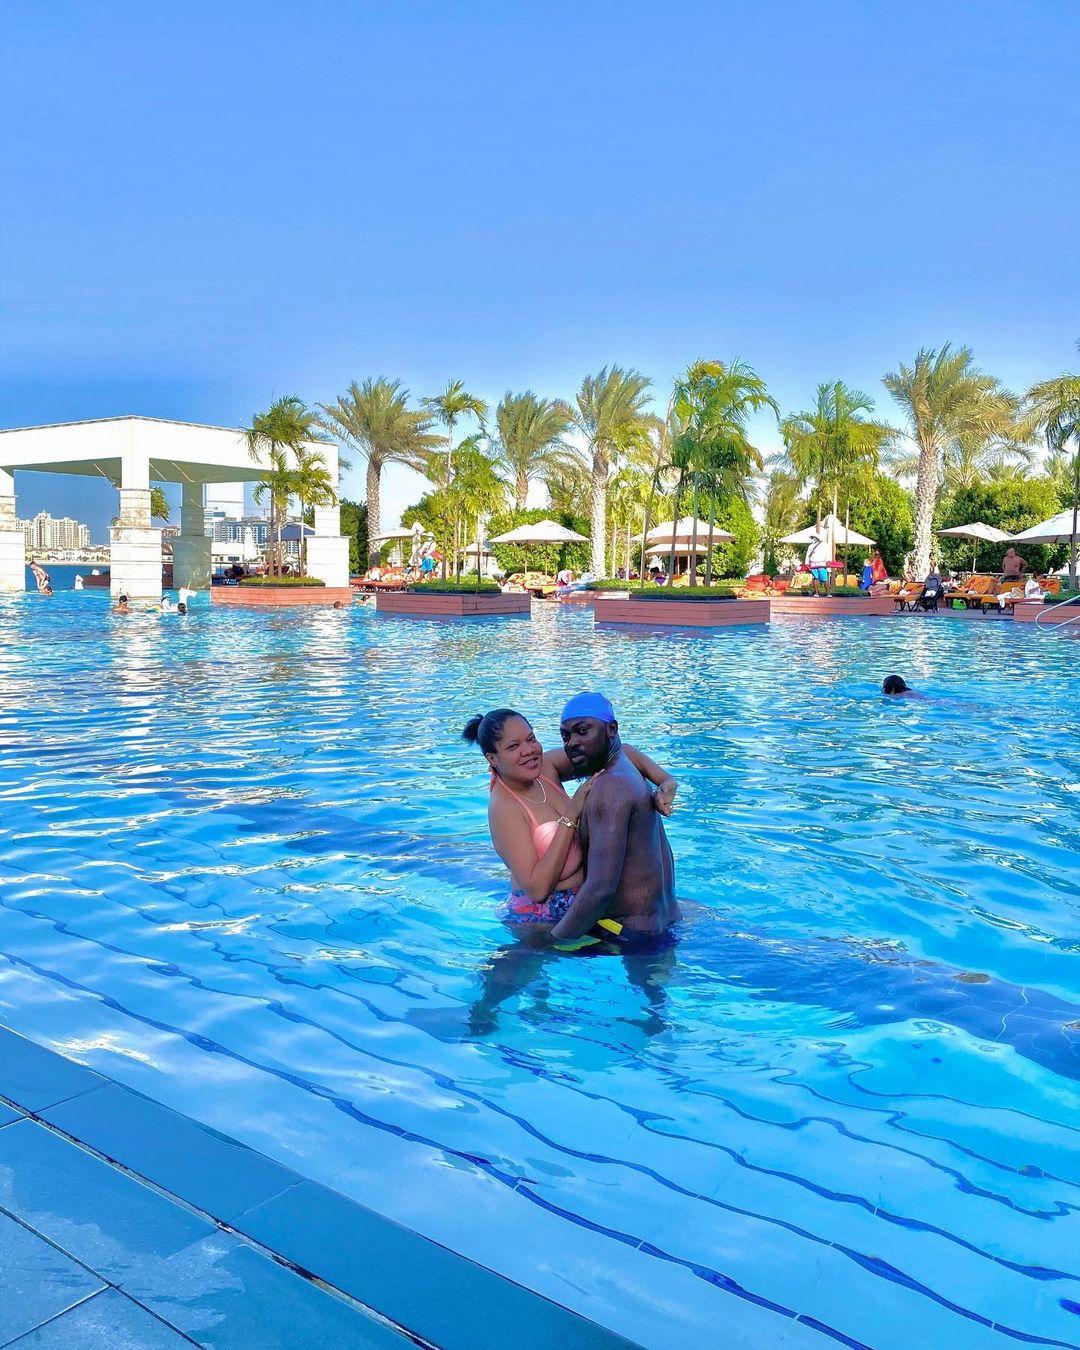 Toyin Abraham praises husband for family holiday in Dubai [PHOTOS]